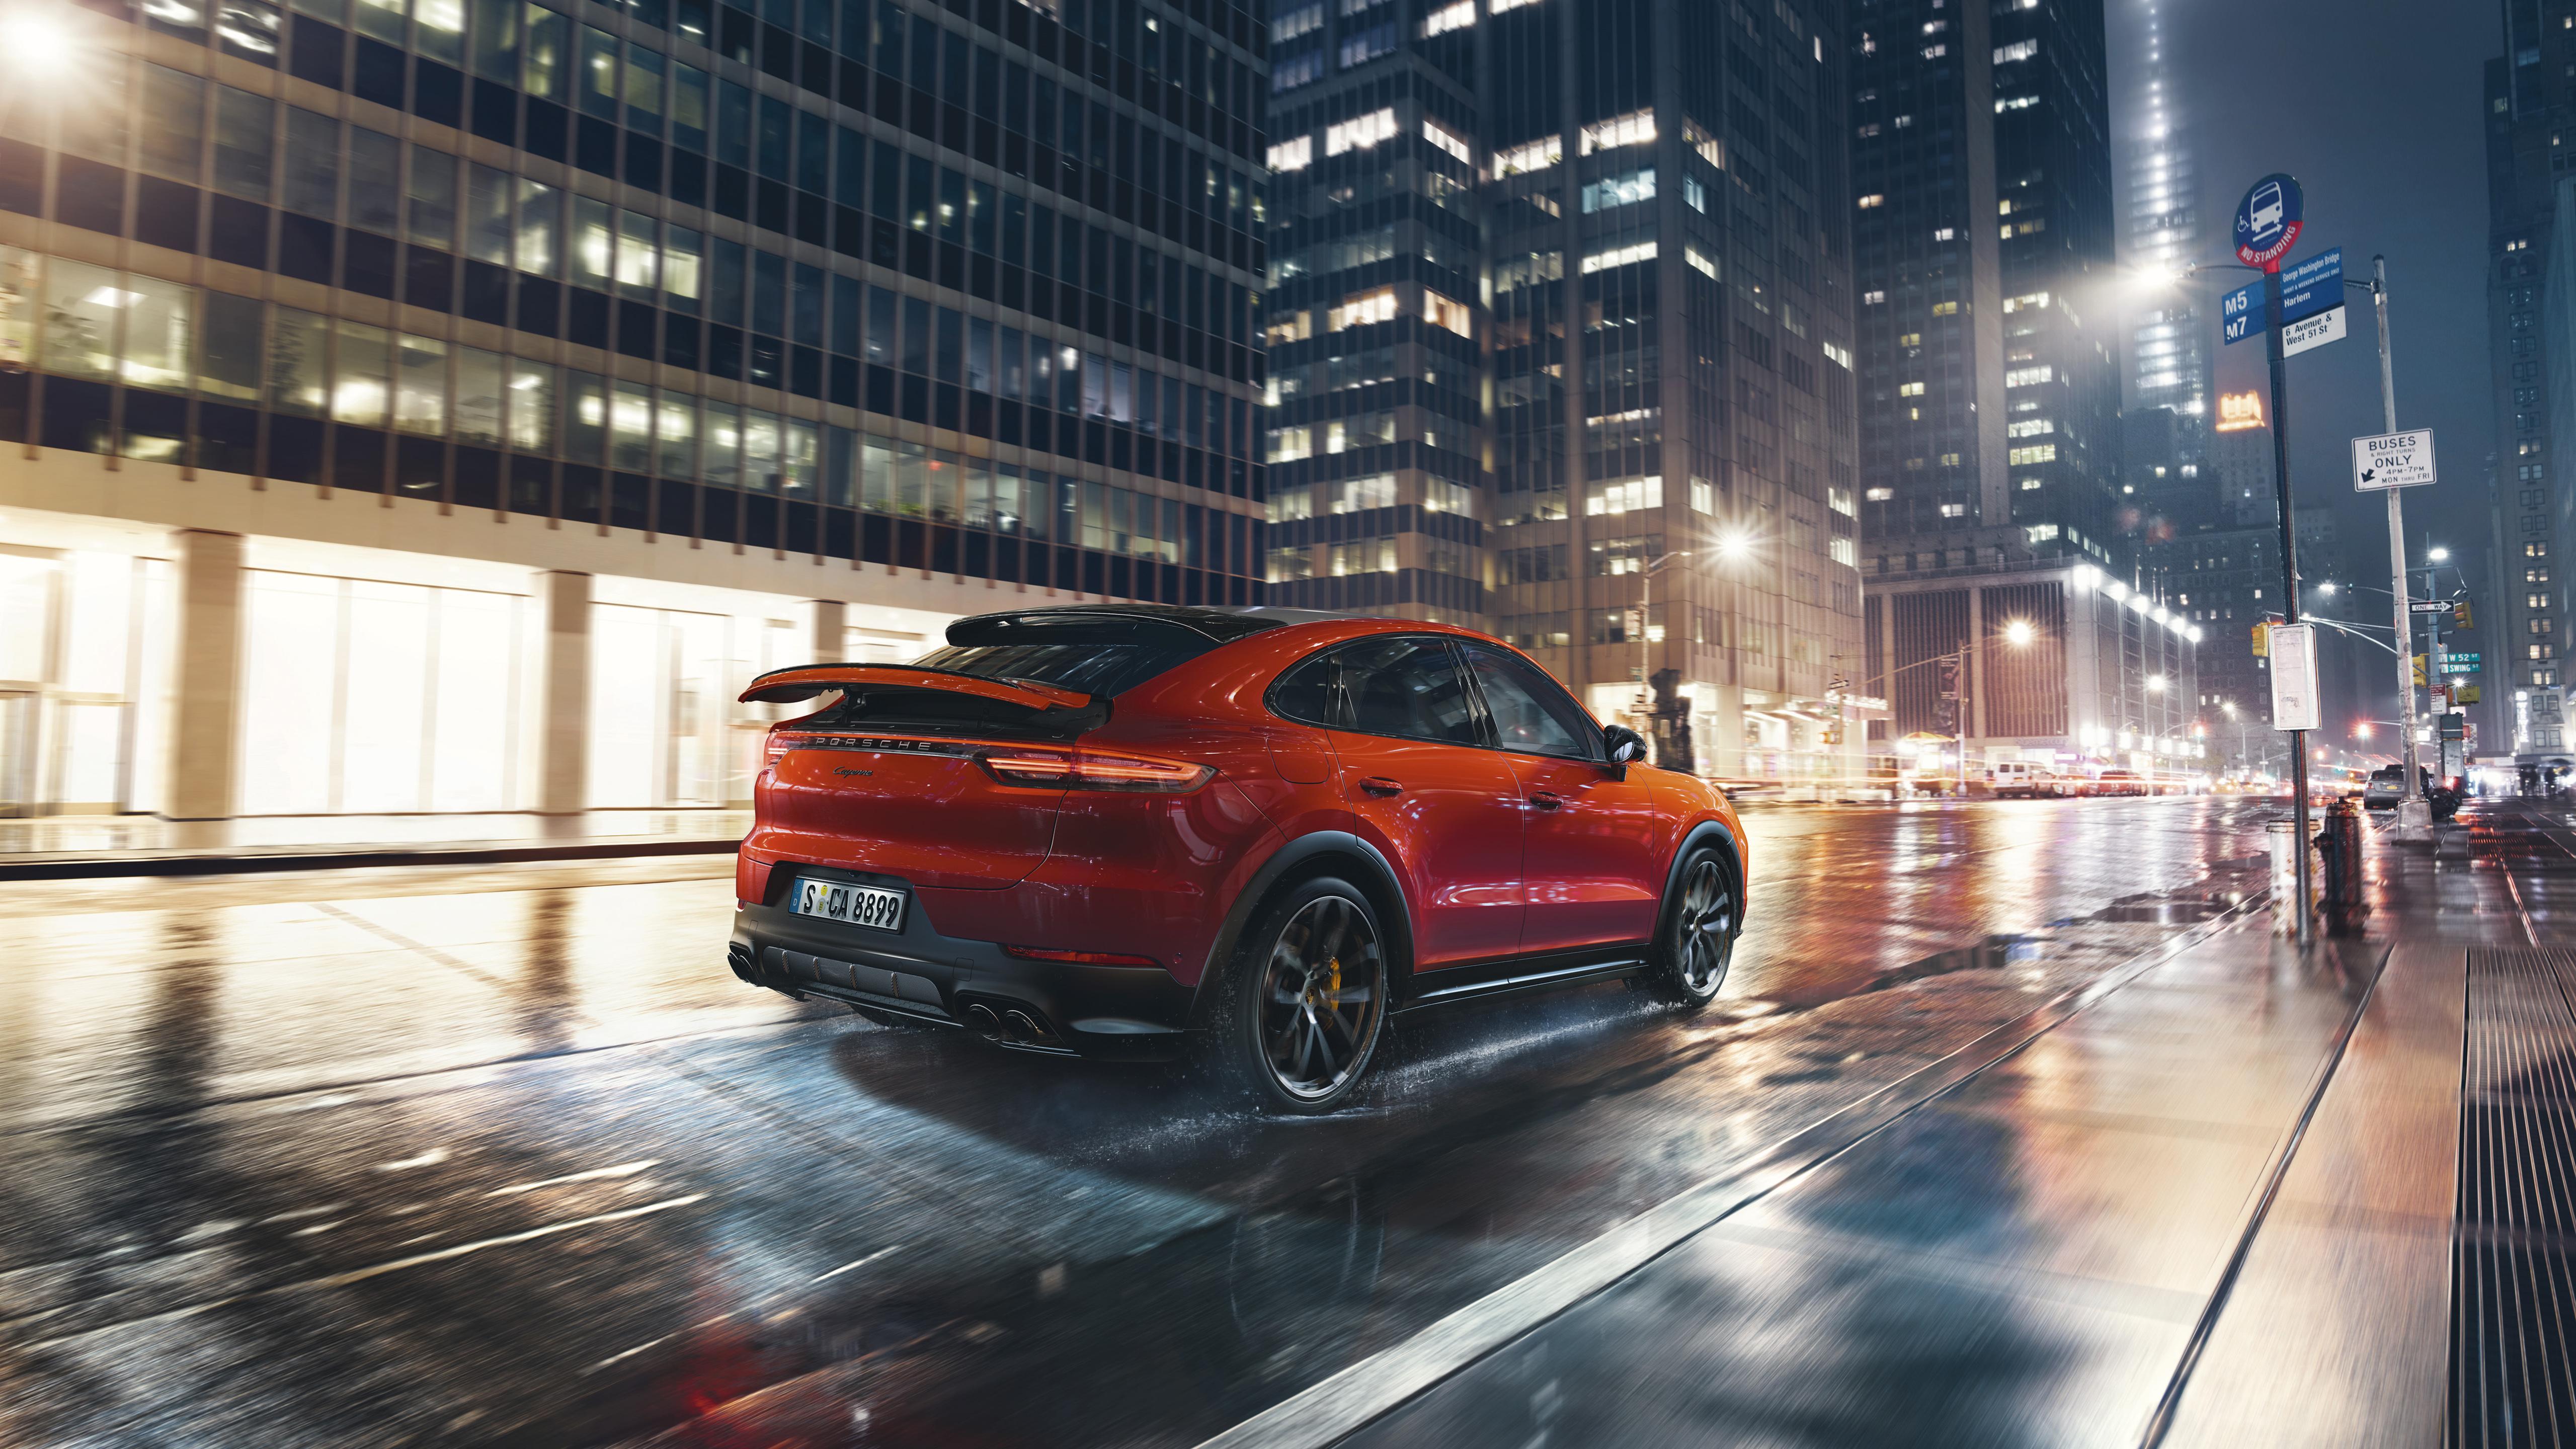 Porsche Cayenne Coupe 2019 4K 4 Wallpaper HD Car Wallpapers ID 5120x2880